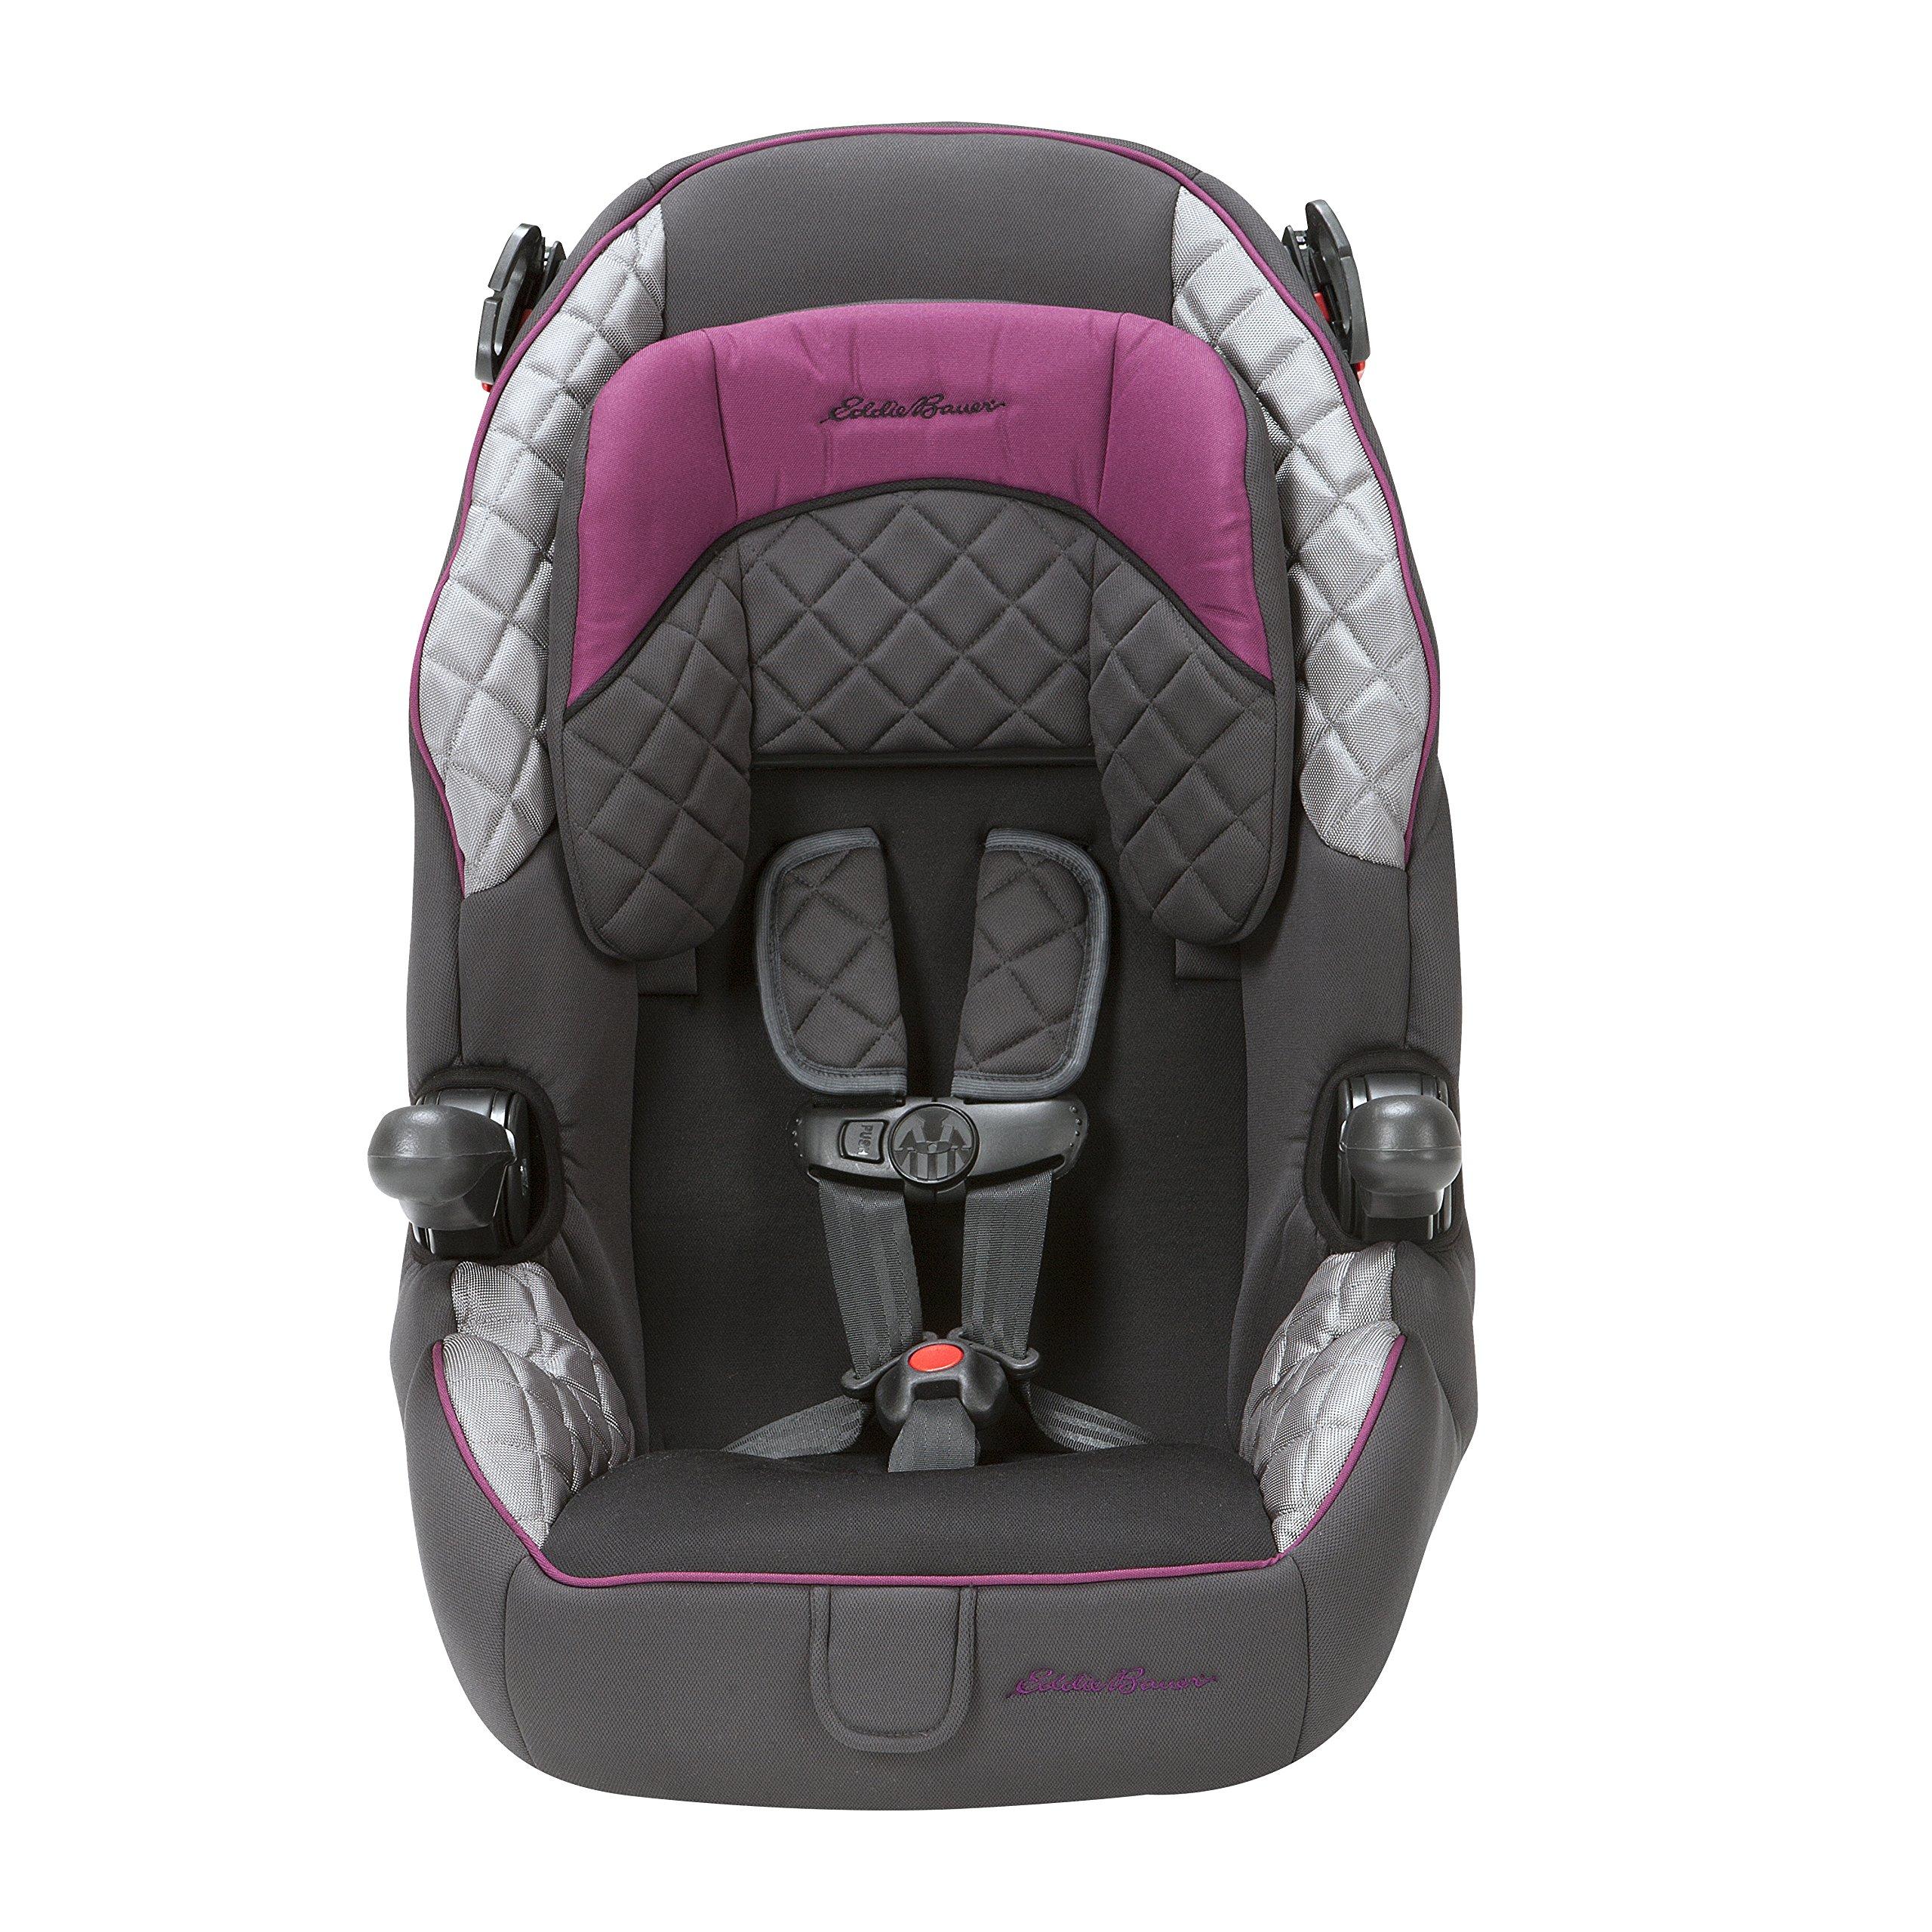 Aidia Car Seats Reviews